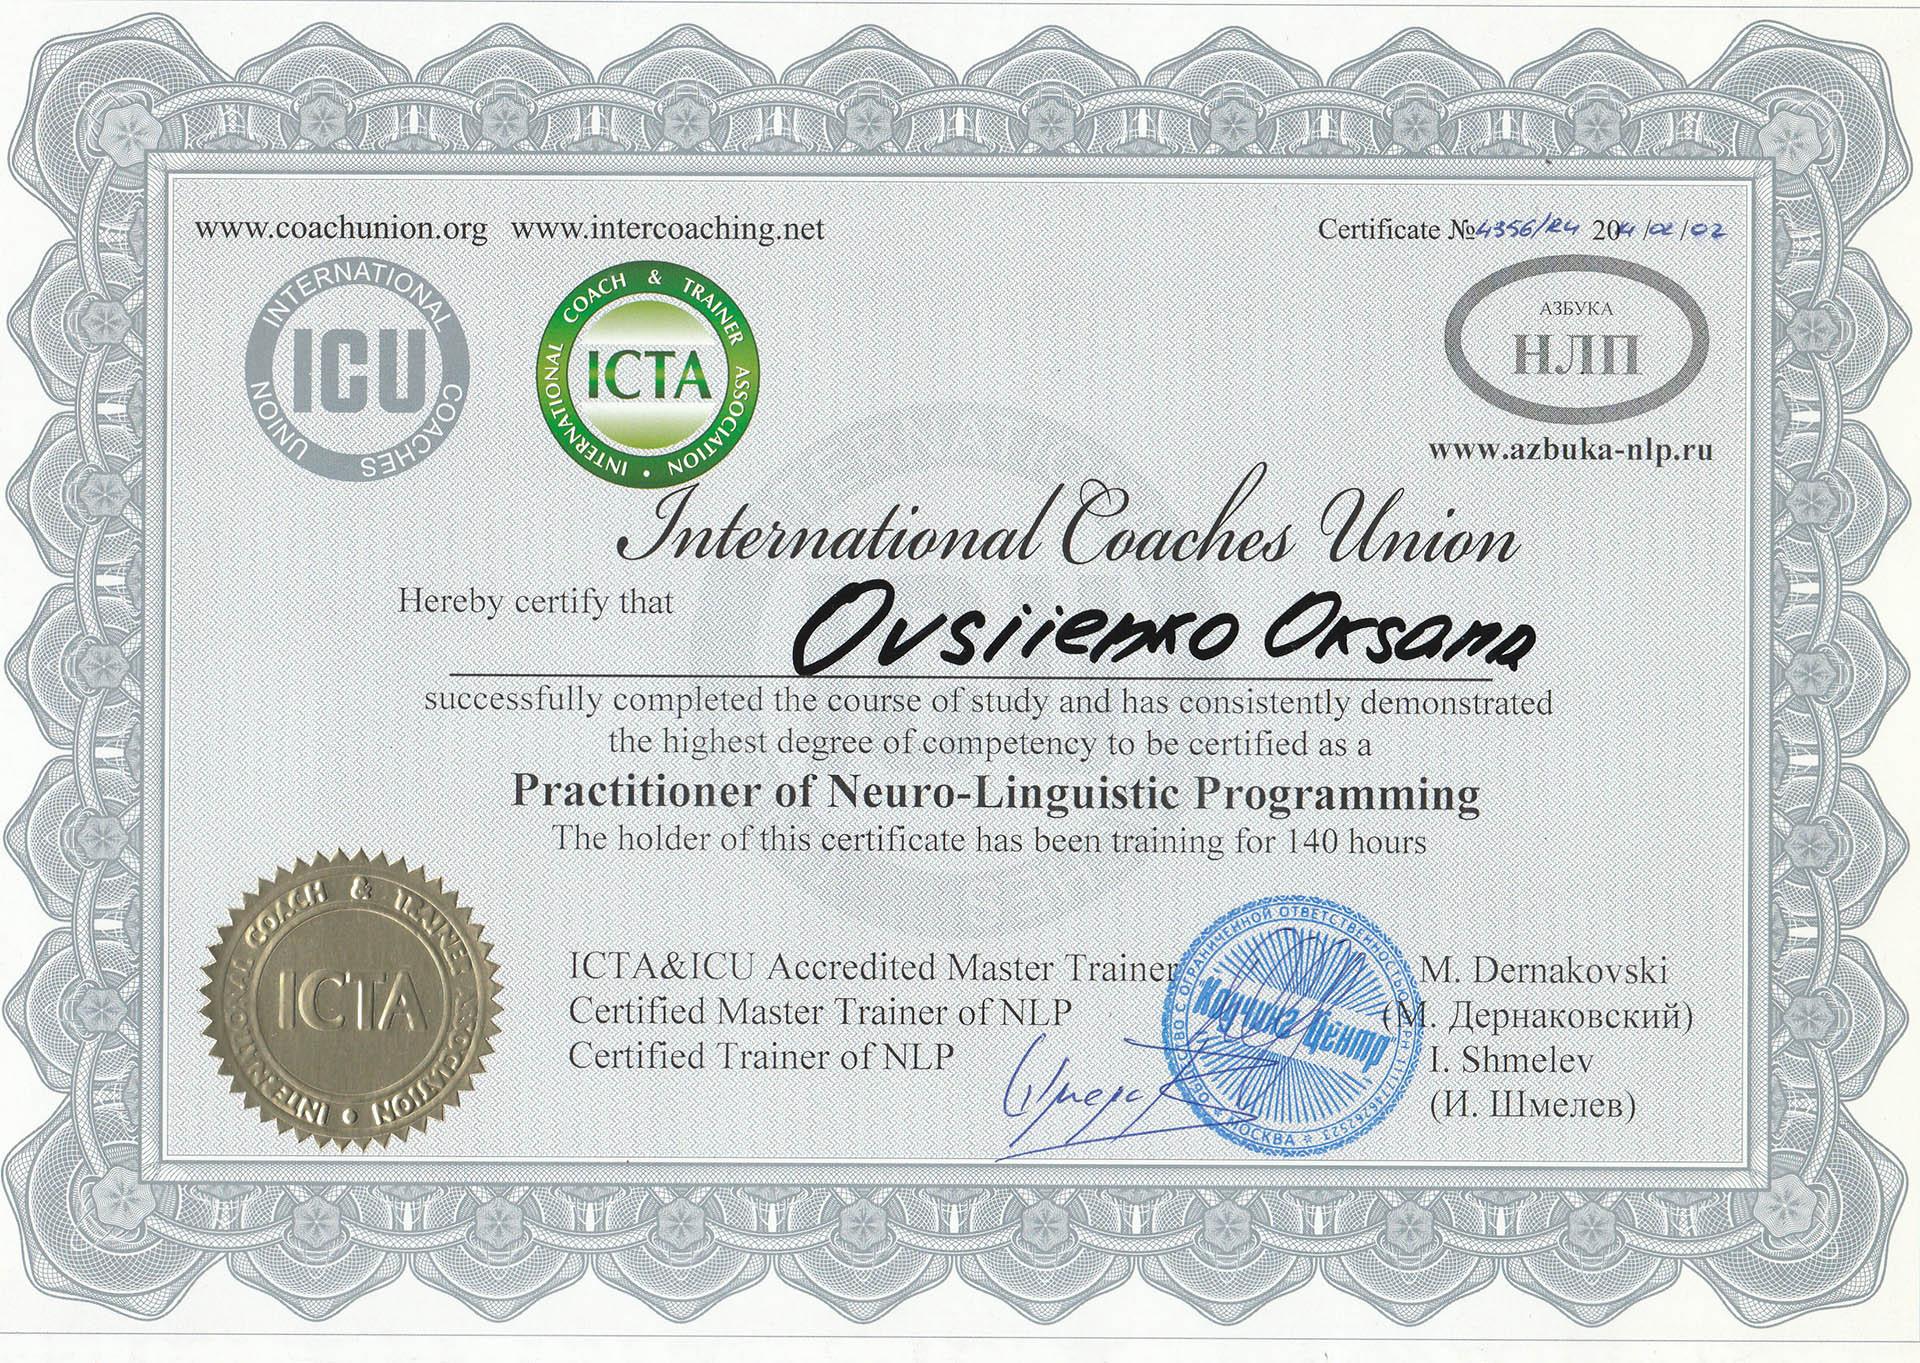 Овсиенко Оксана Сертификат  ICU ICTA